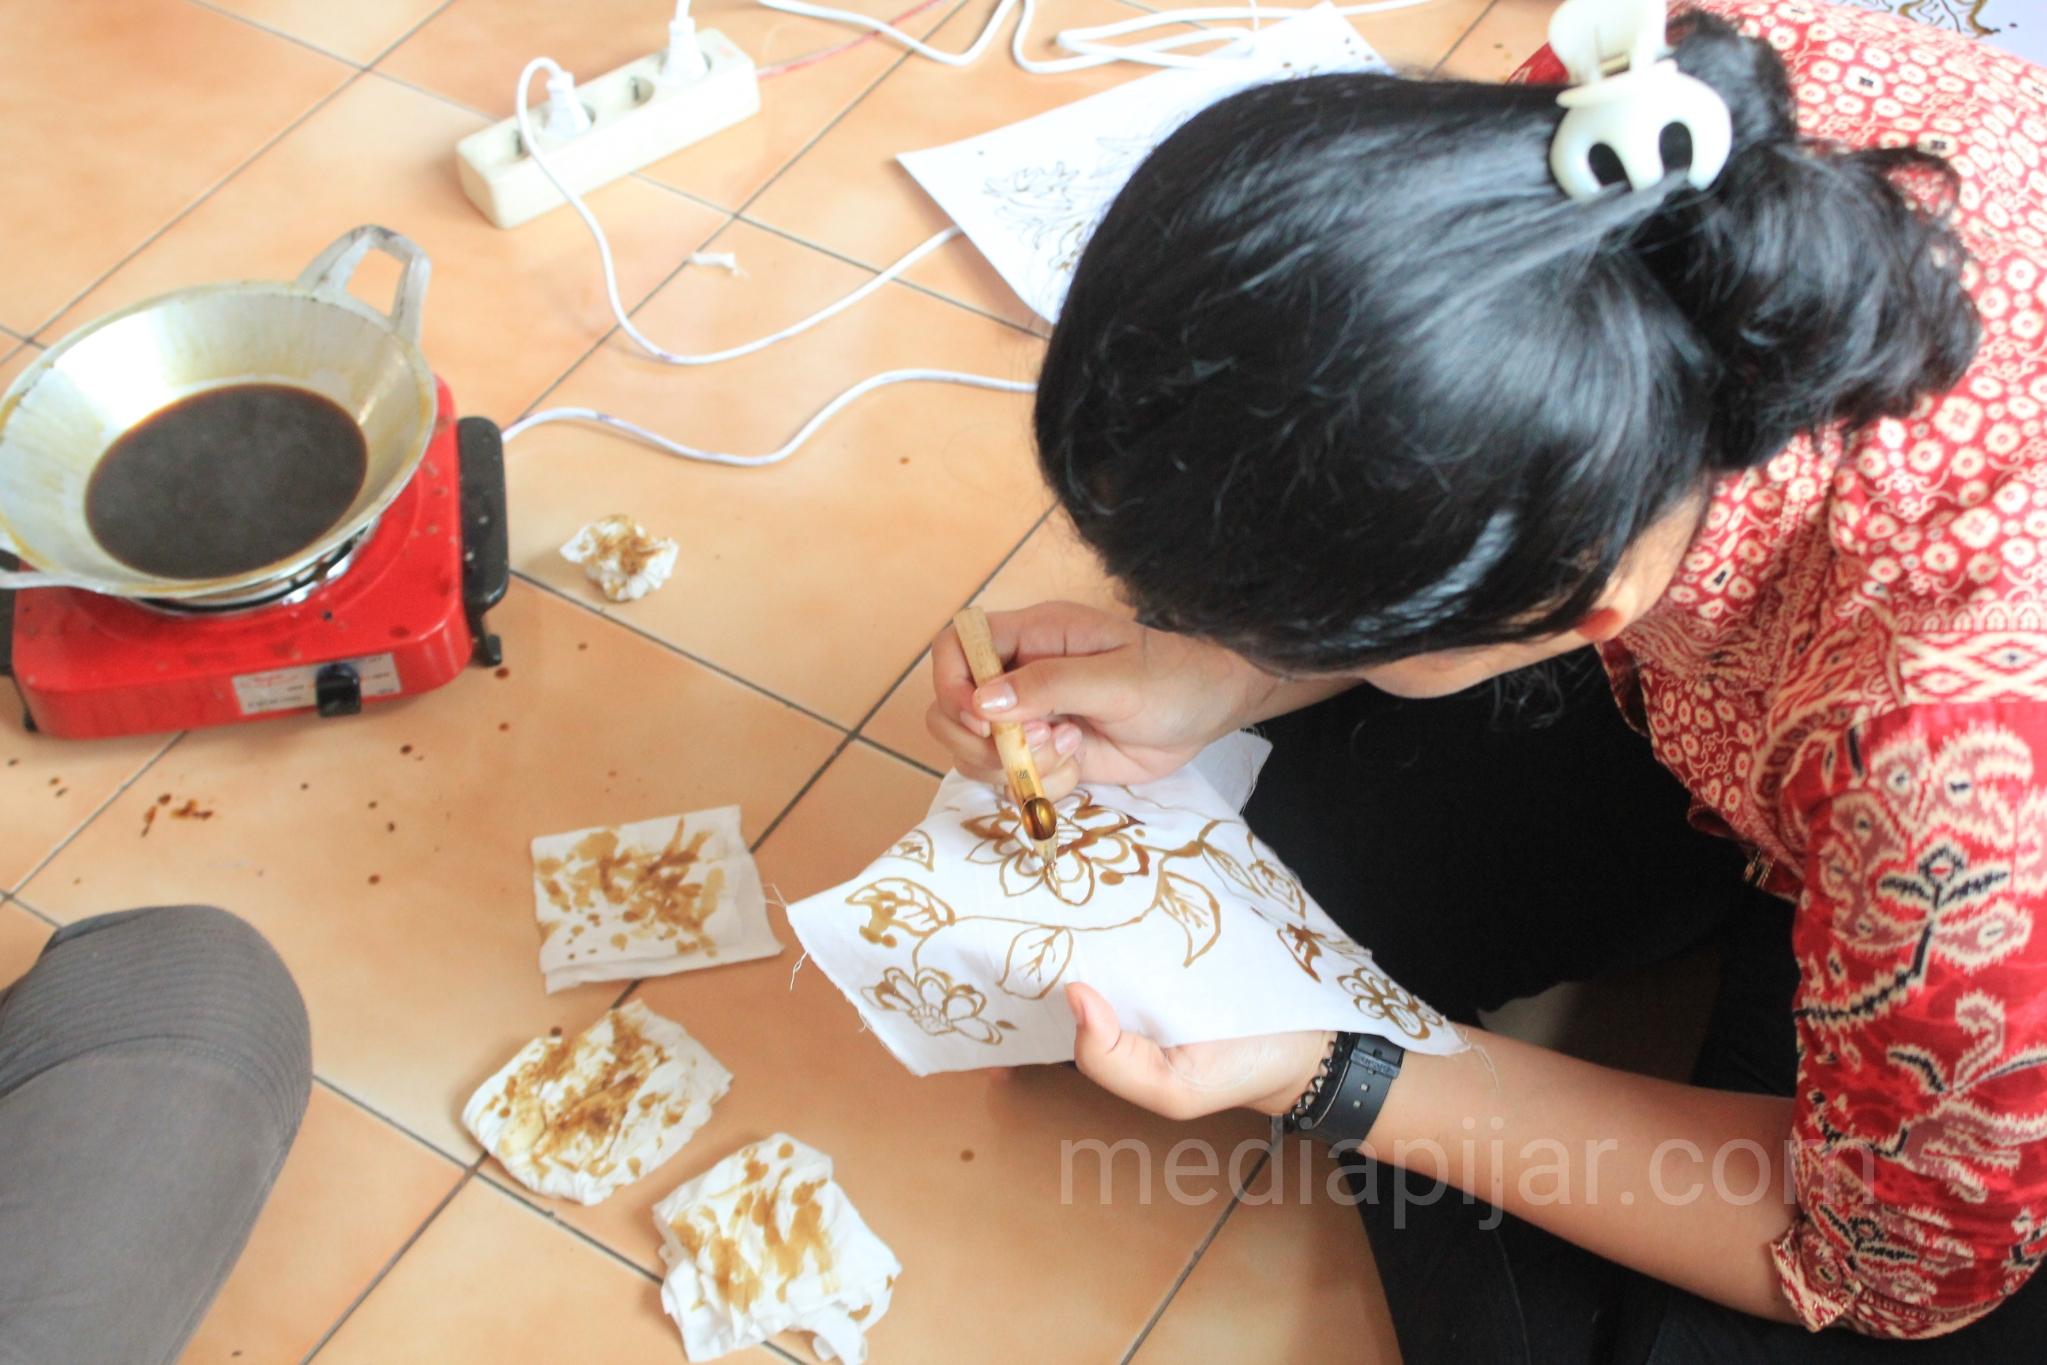 Foto salah satu peserta sedang membatik di atas kain motif dalam acara Lapak Budaya yang dilaksanakan di lantai 2 Sekretariat Pema USU pada Jum'at (29/3) (Fotografer: Indah Ramadhanti)